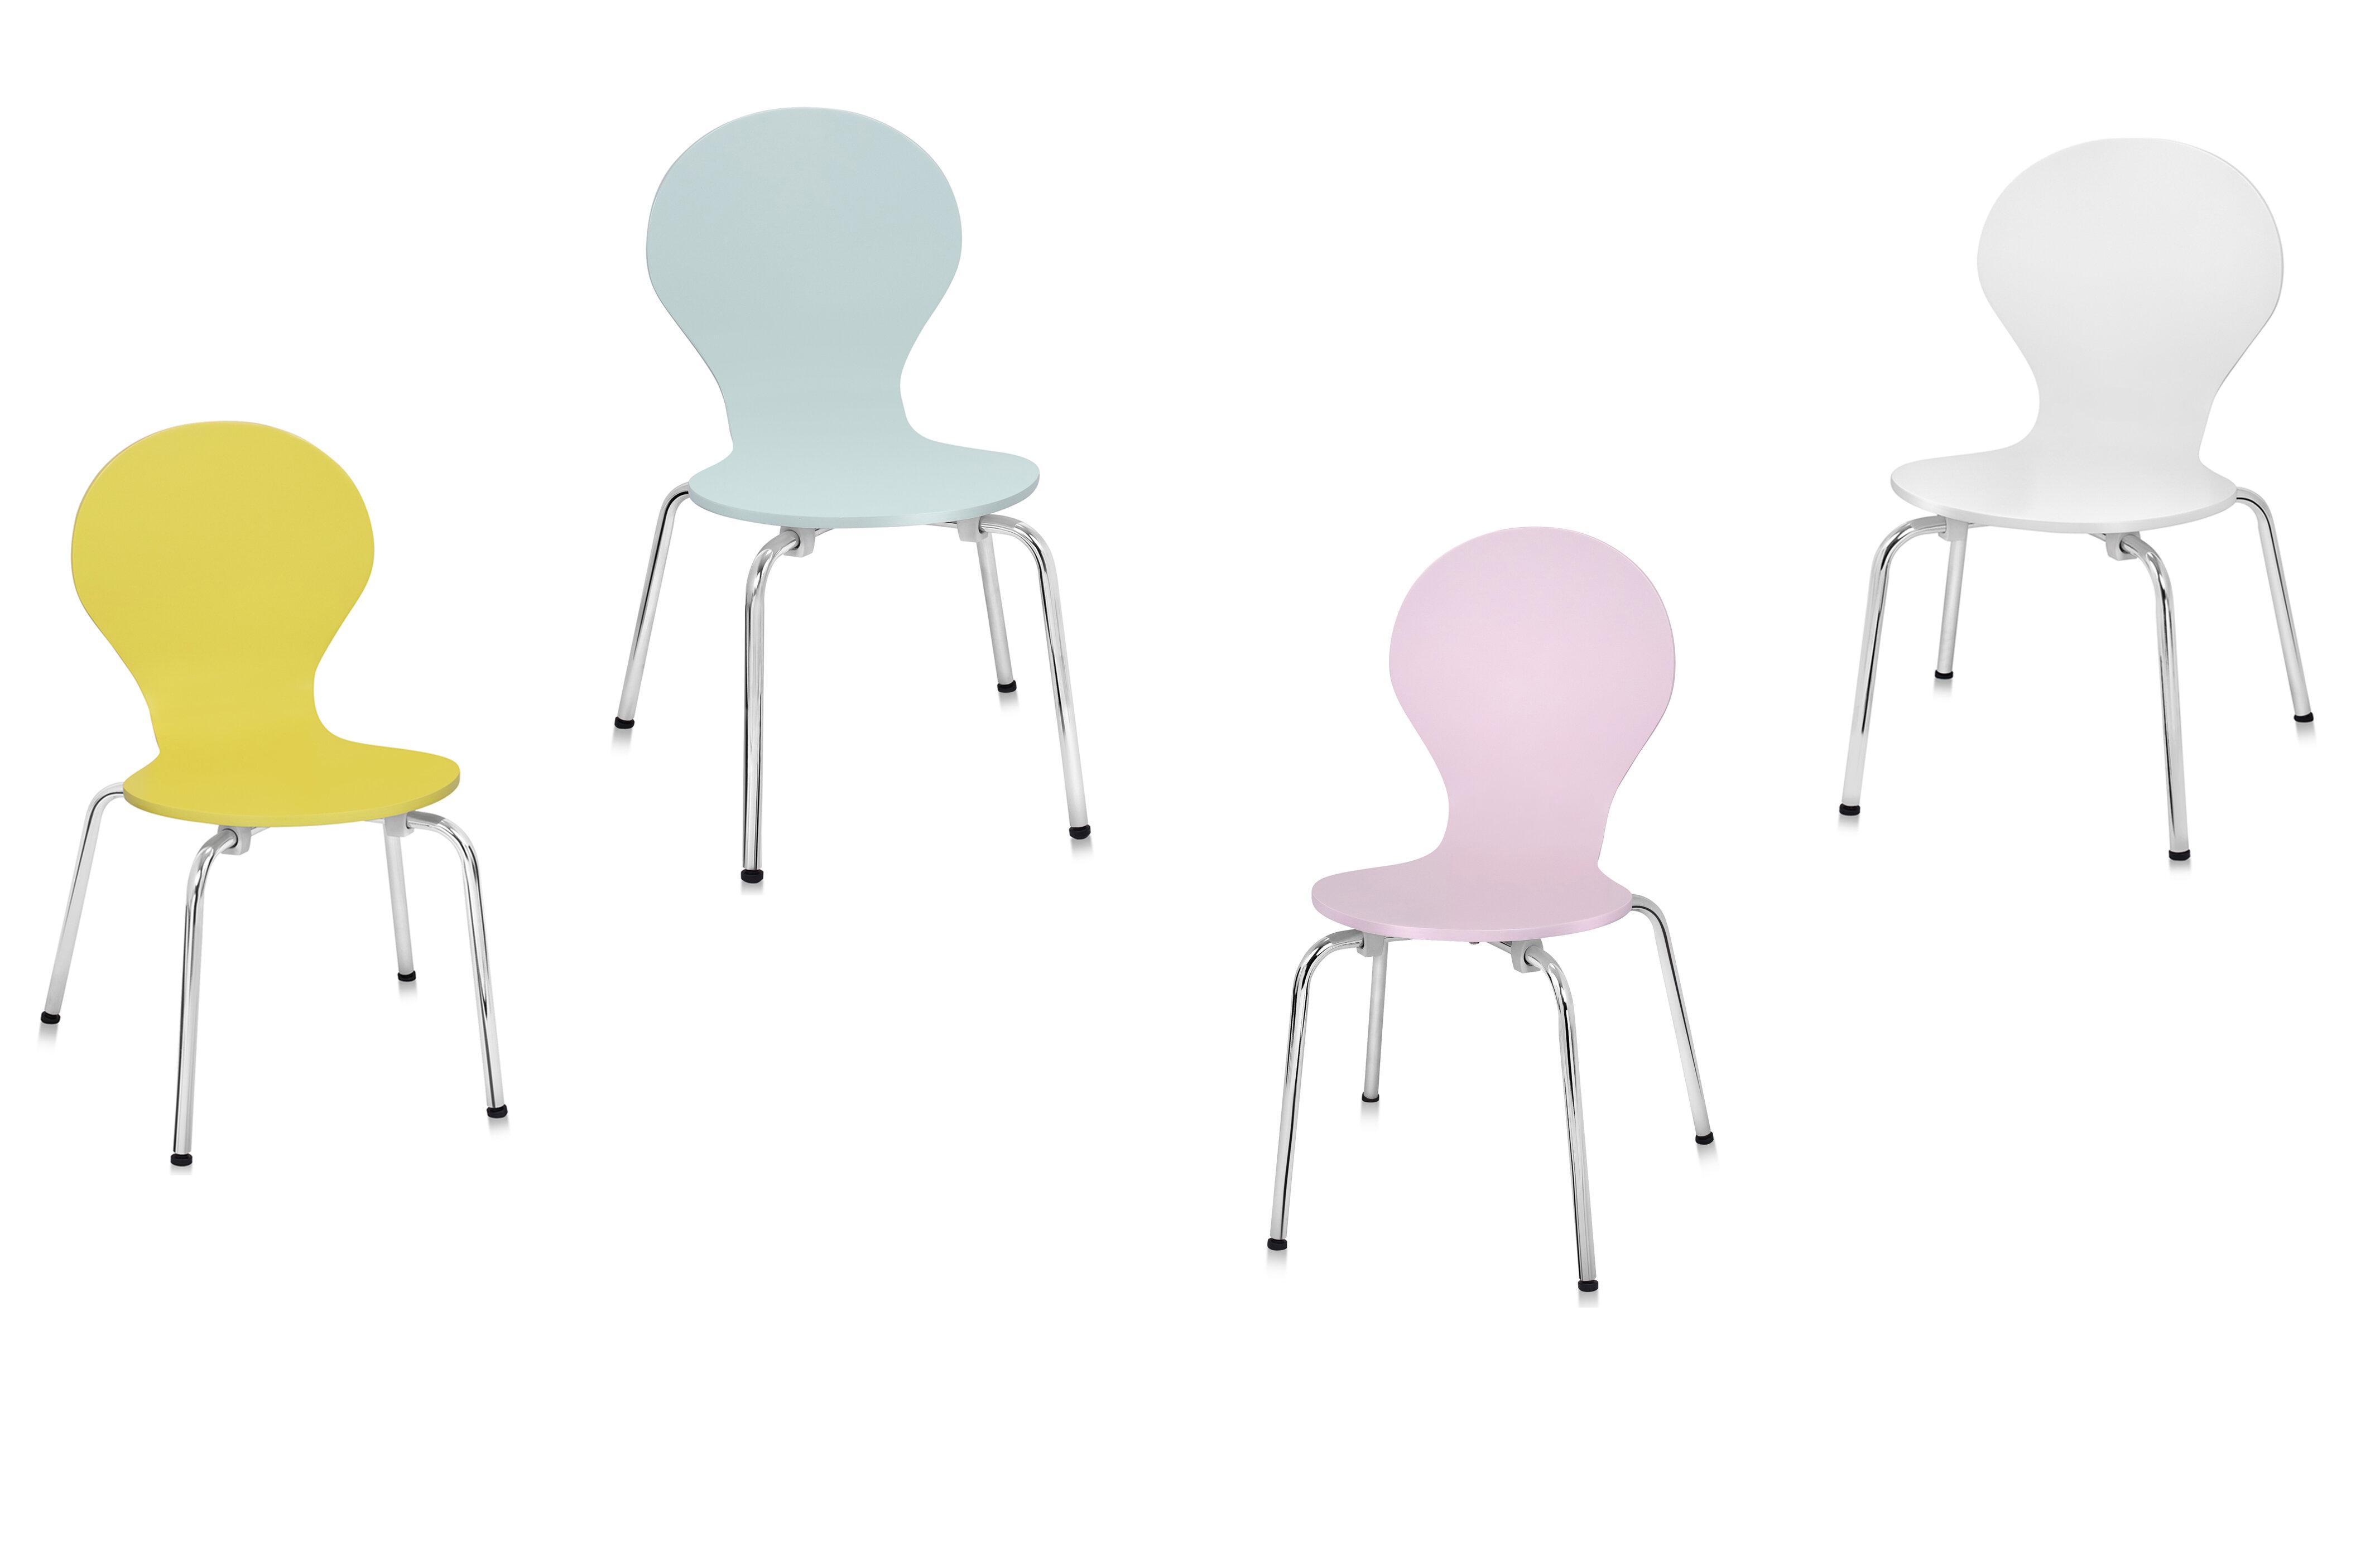 chair desk retro licensing little painted furniture hutch girl s hand girls hip work illustrations art